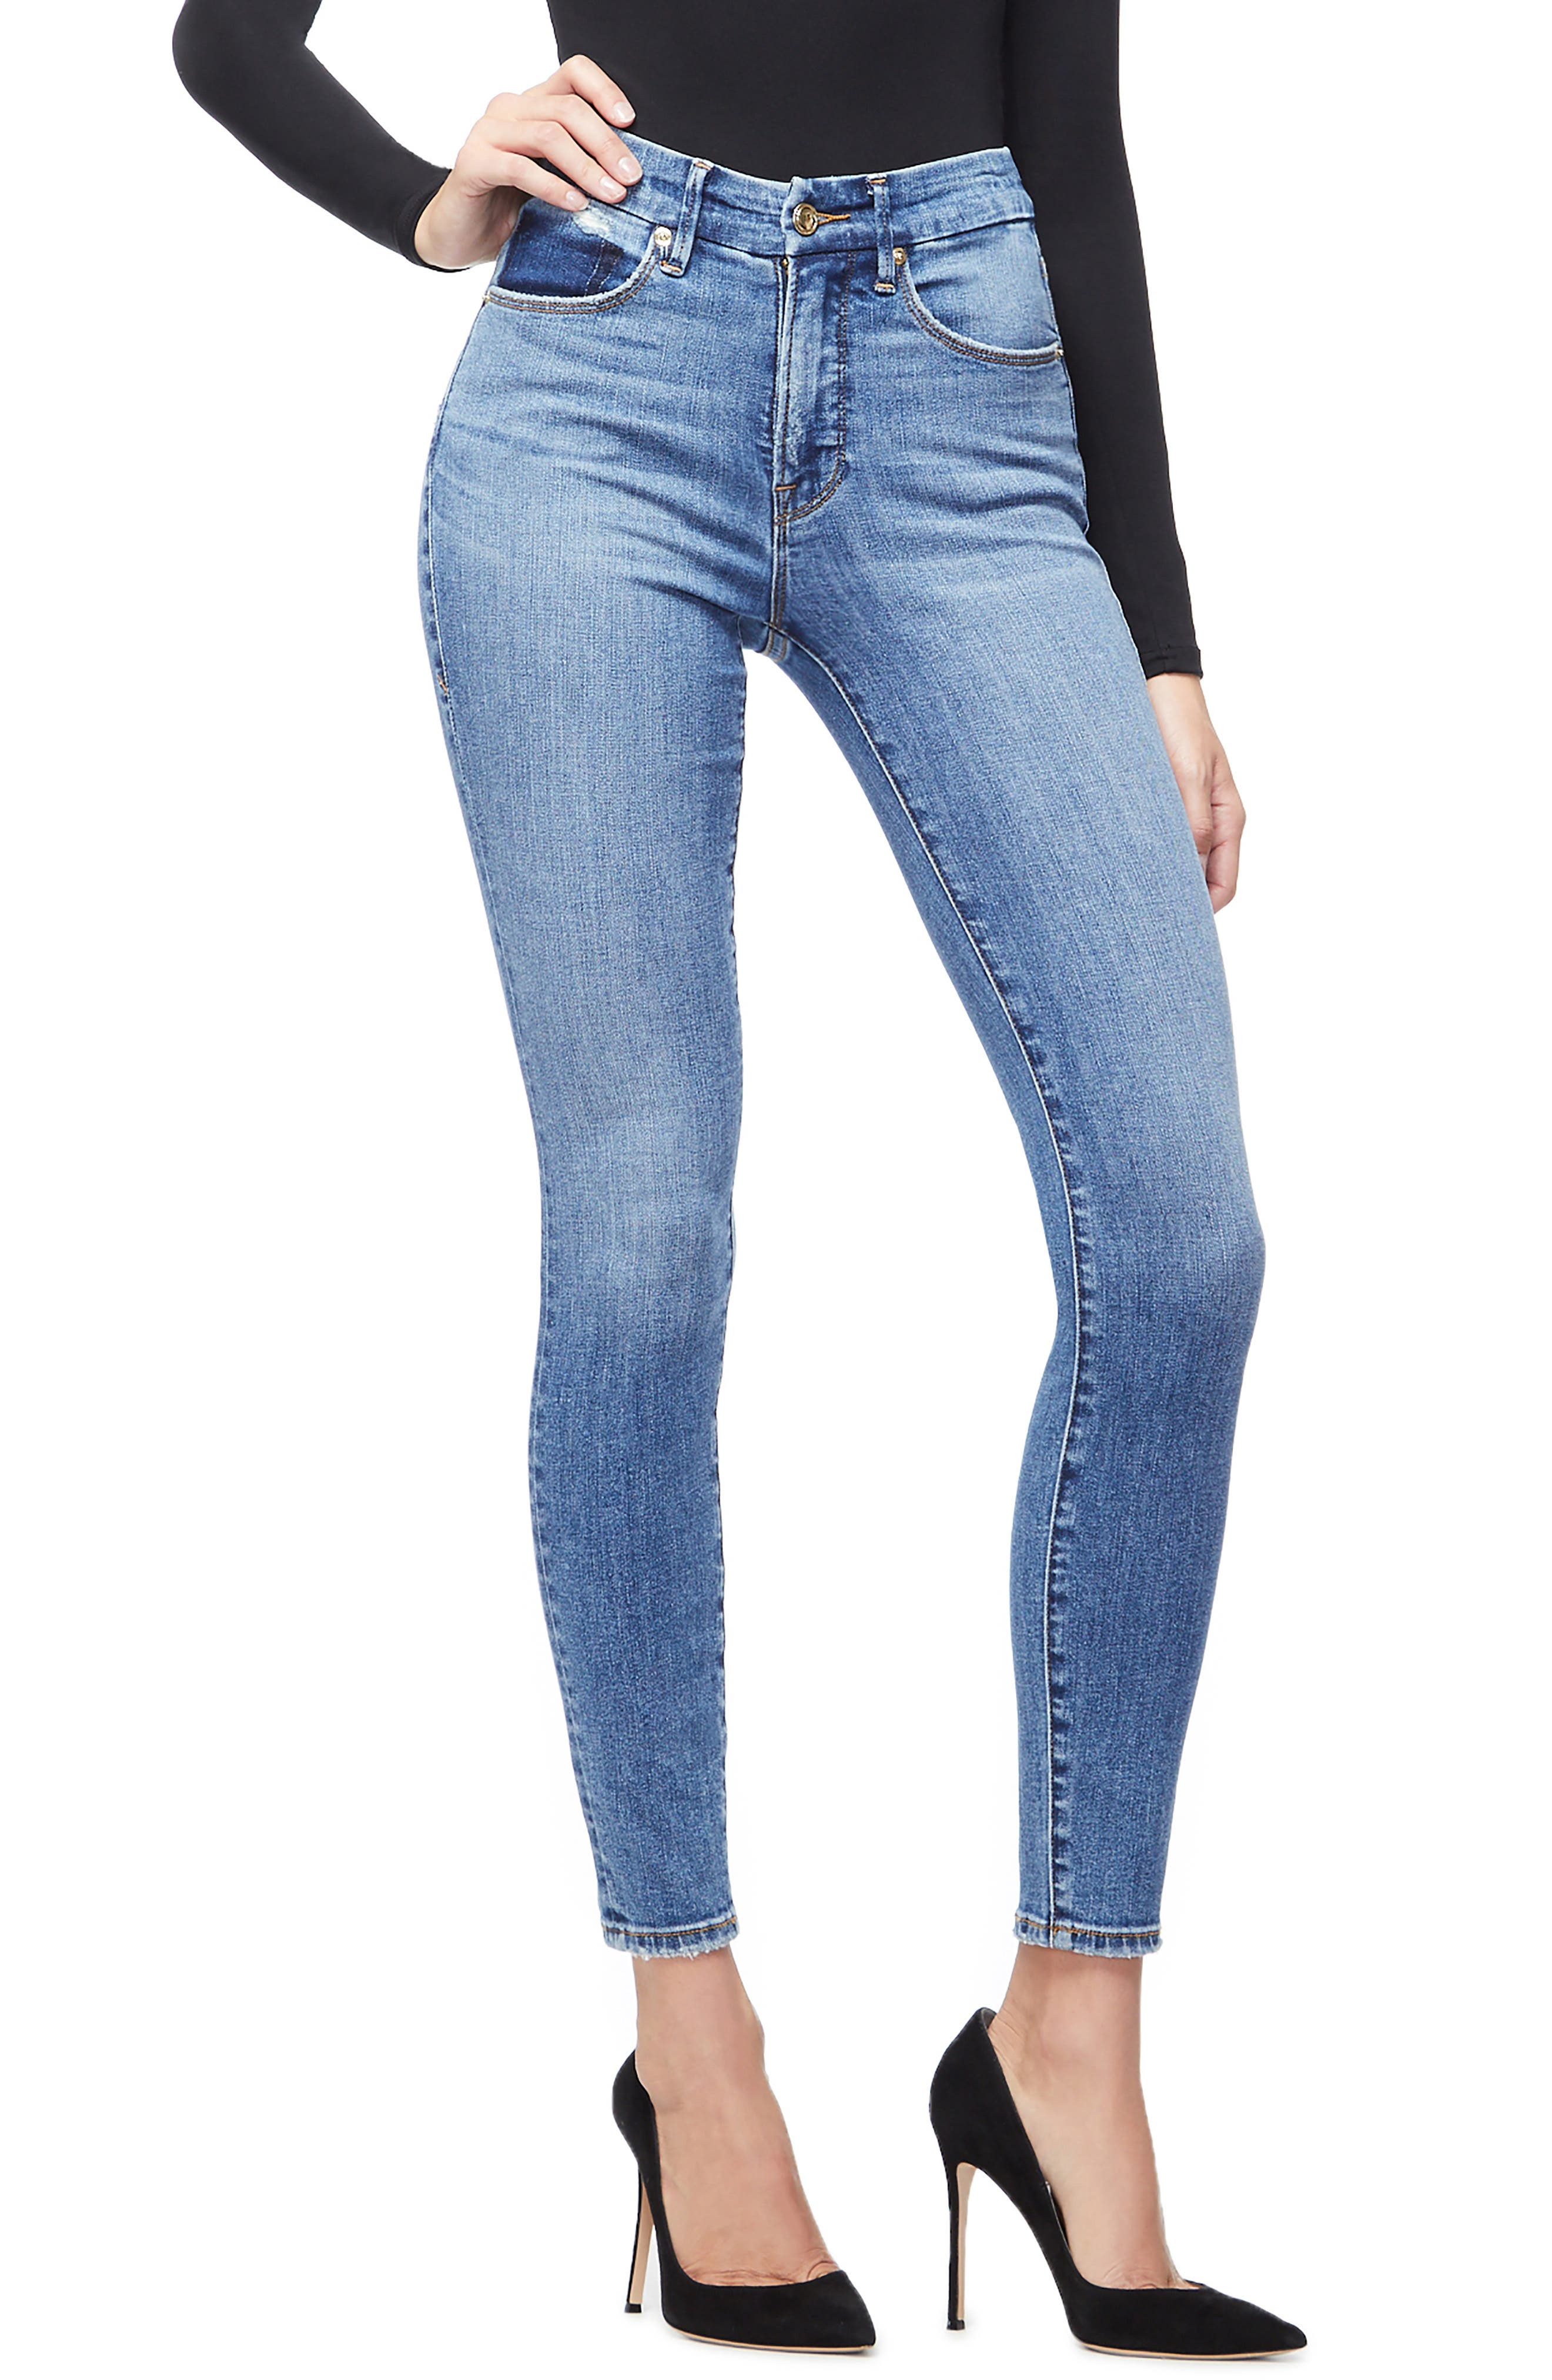 GOOD AMERICAN, Good Waist High Waist Skinny Jeans, Main thumbnail 1, color, BLUE213